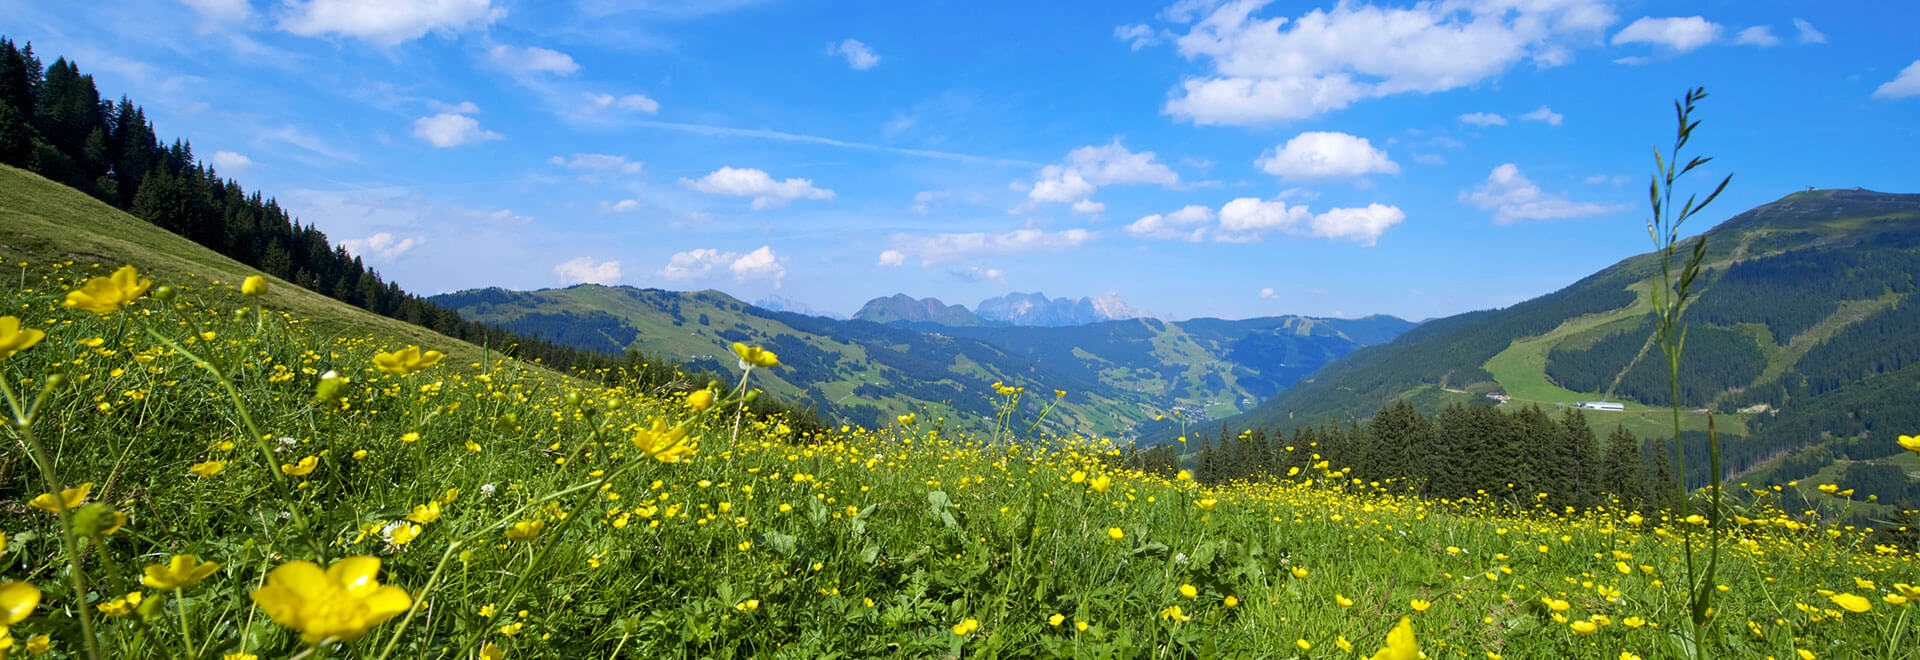 Sommer Saalbach Hinterglemm